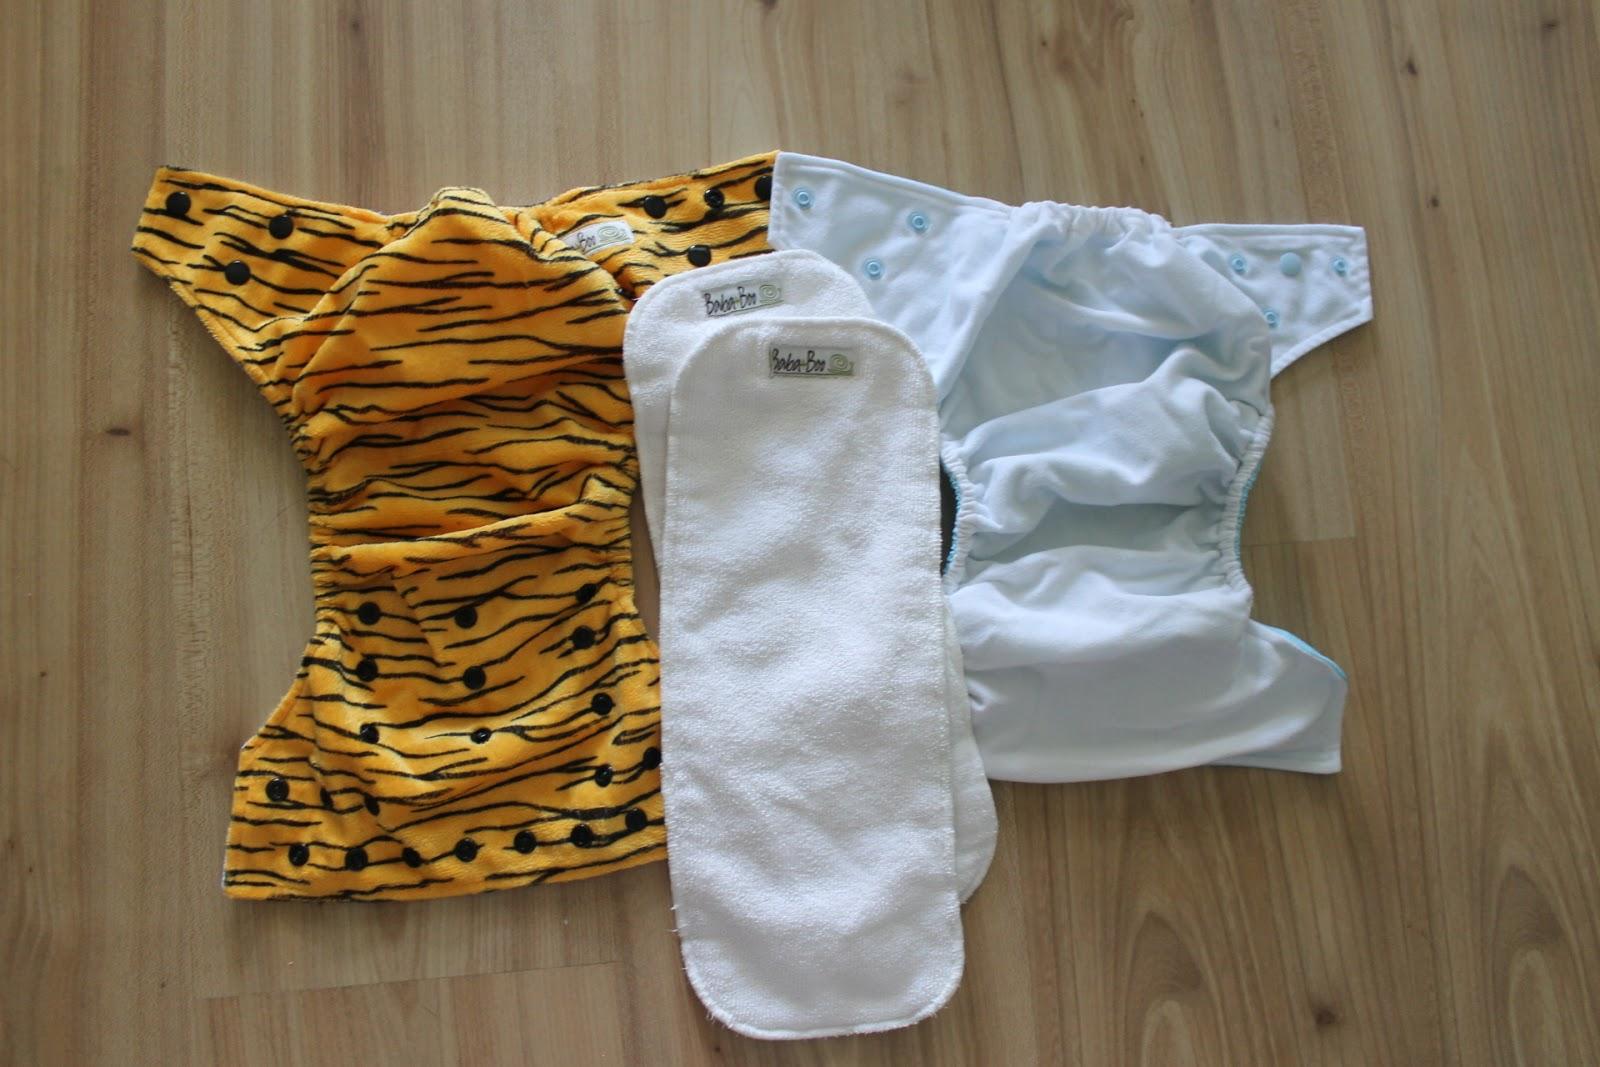 Baba and Boo Cloth Nappy